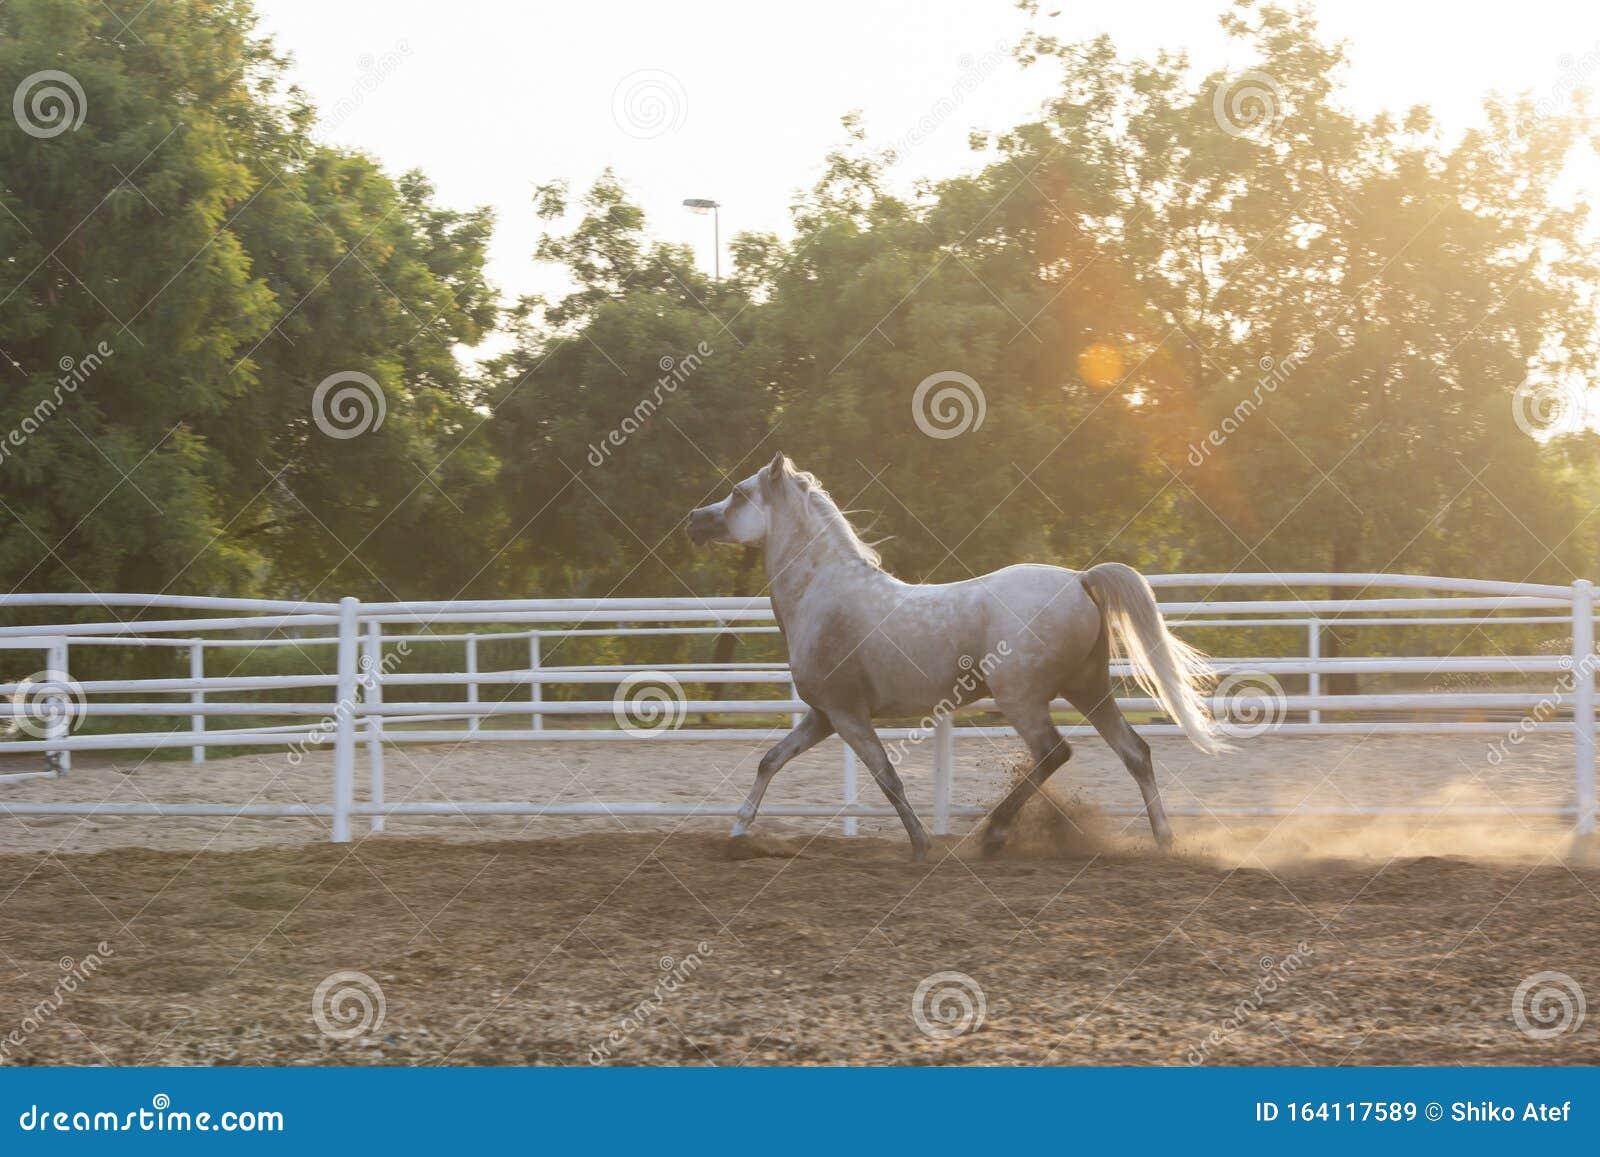 Lovely Arabian White Horse Dubai Stock Image Image Of Stallion Male 164117589